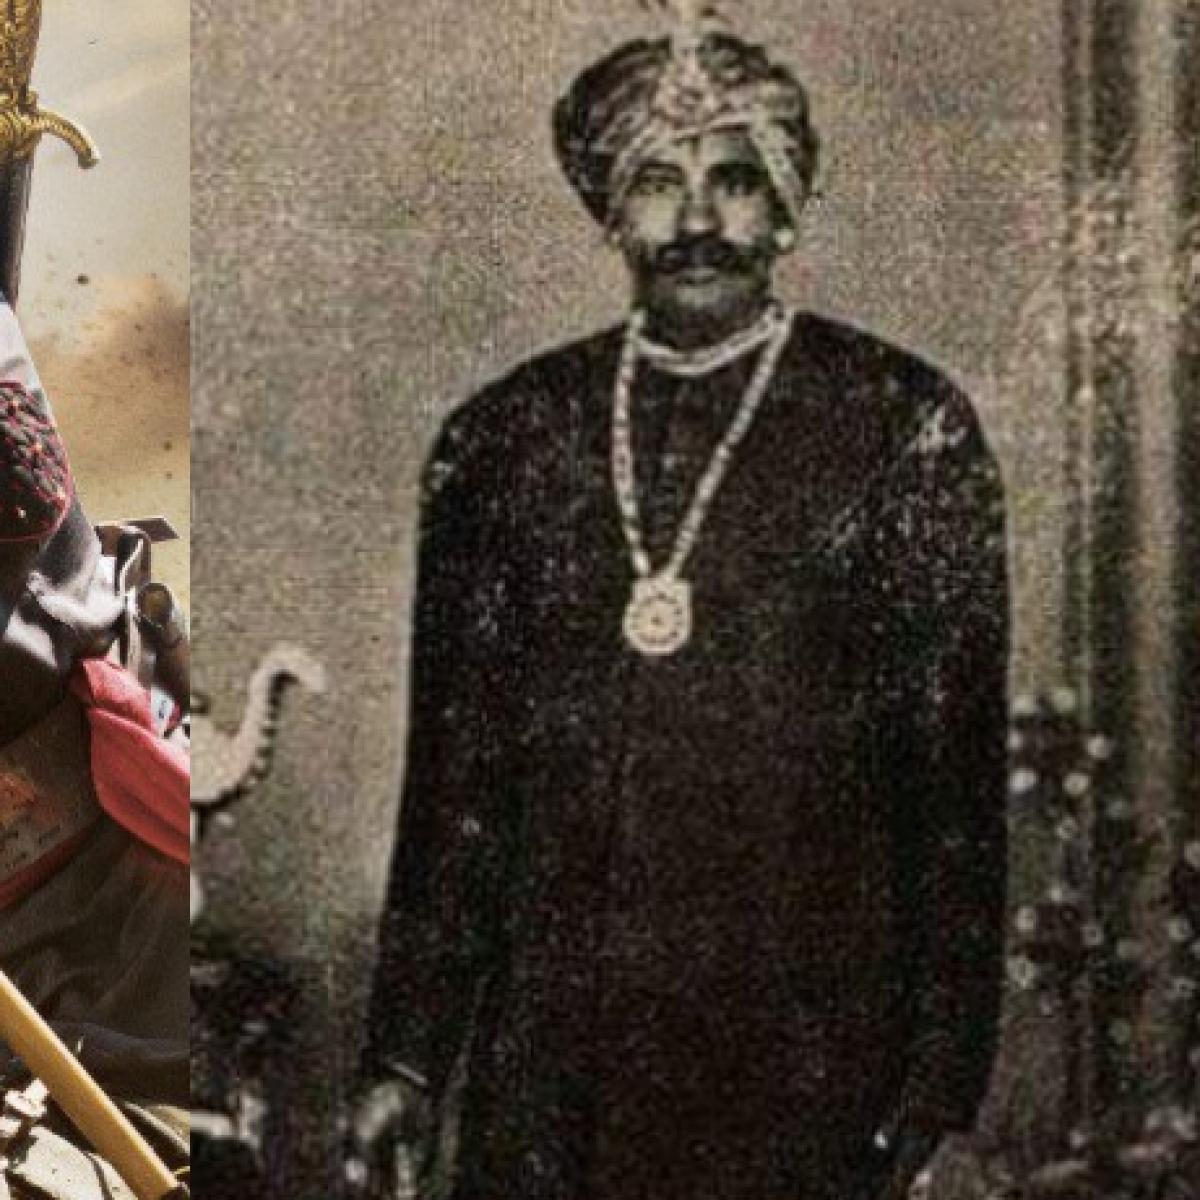 Read the true story of 'Sye Raa' Uyyalawada Narasimha Reddy- First rebel against British